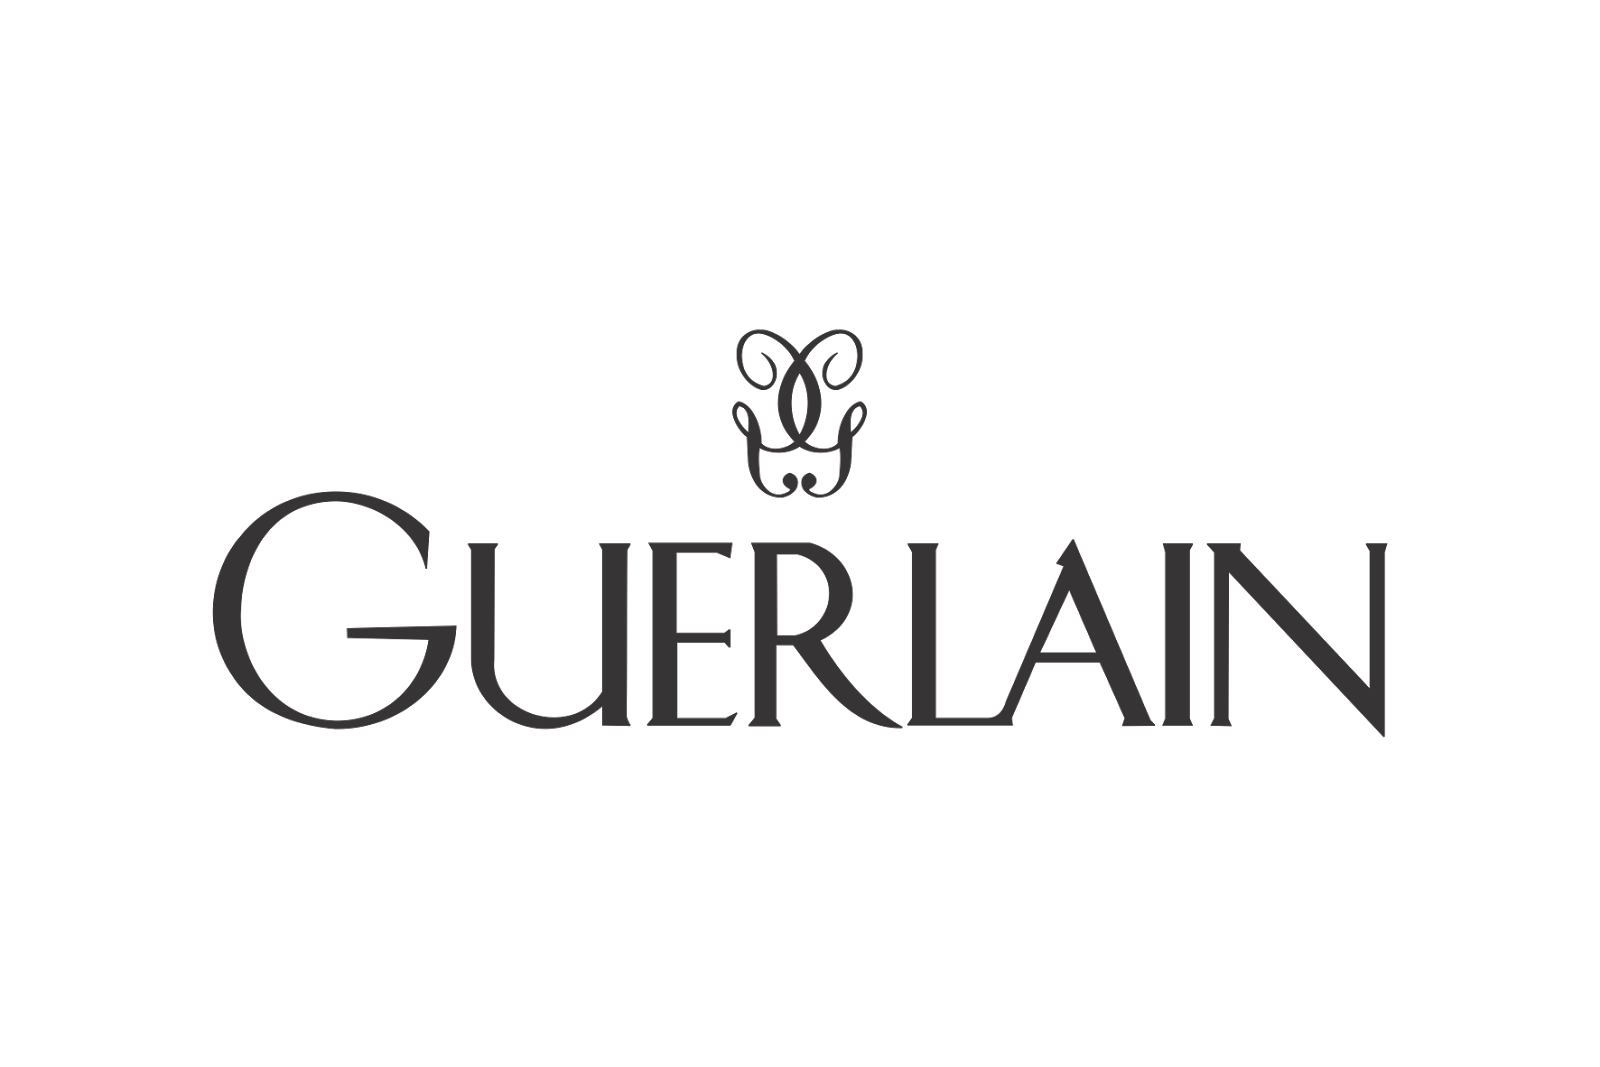 guerlain logo logoshare